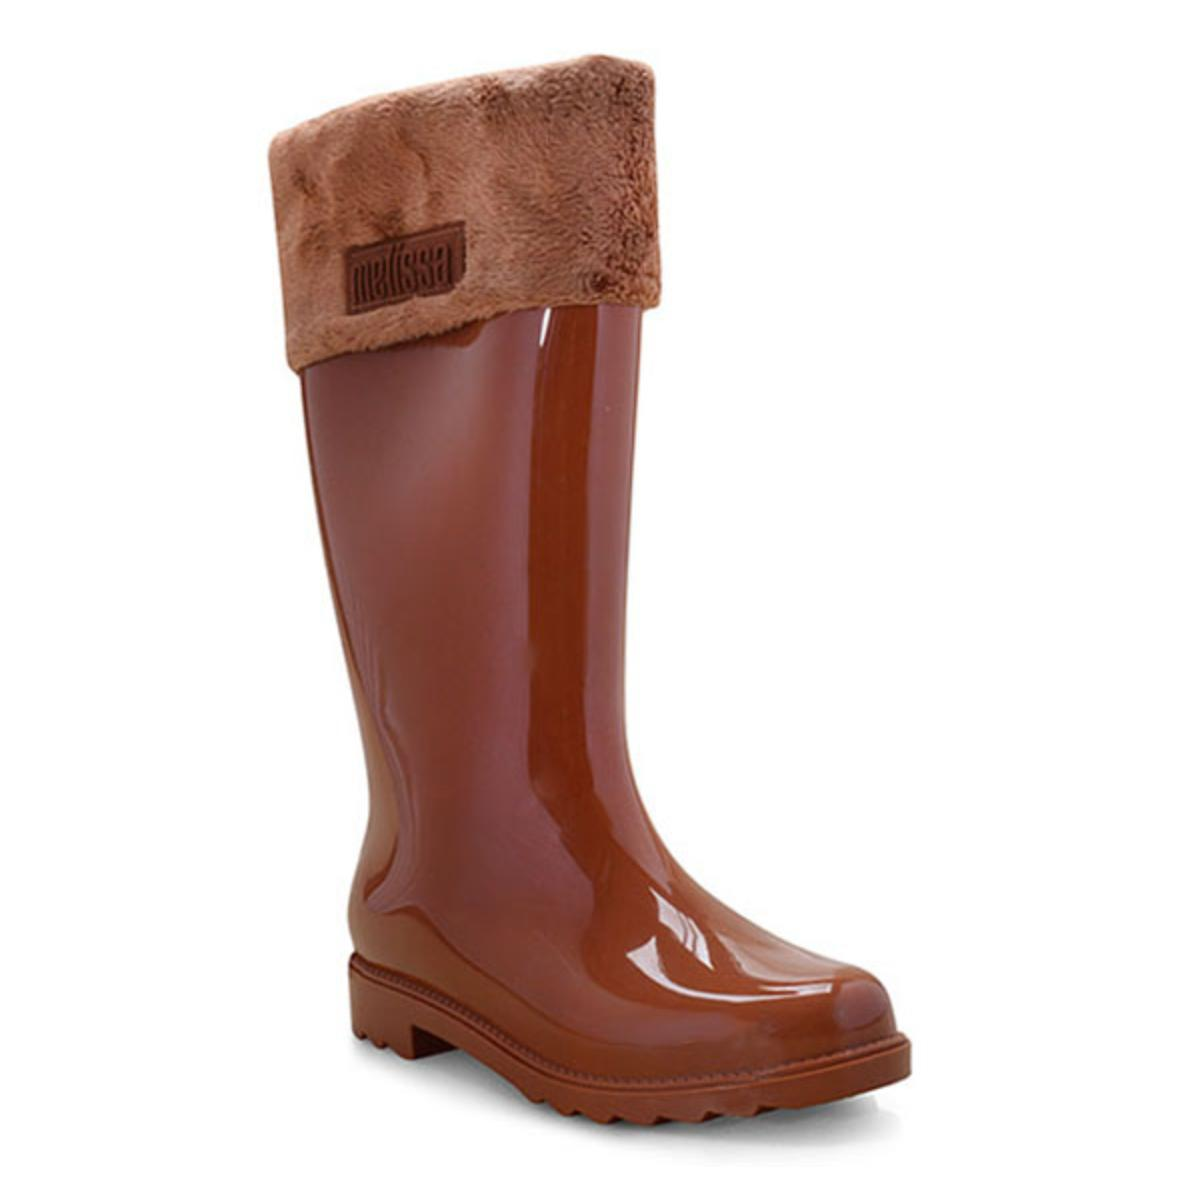 Bota Feminina Melissa 32586 50526 Winter Boot ii Marrom